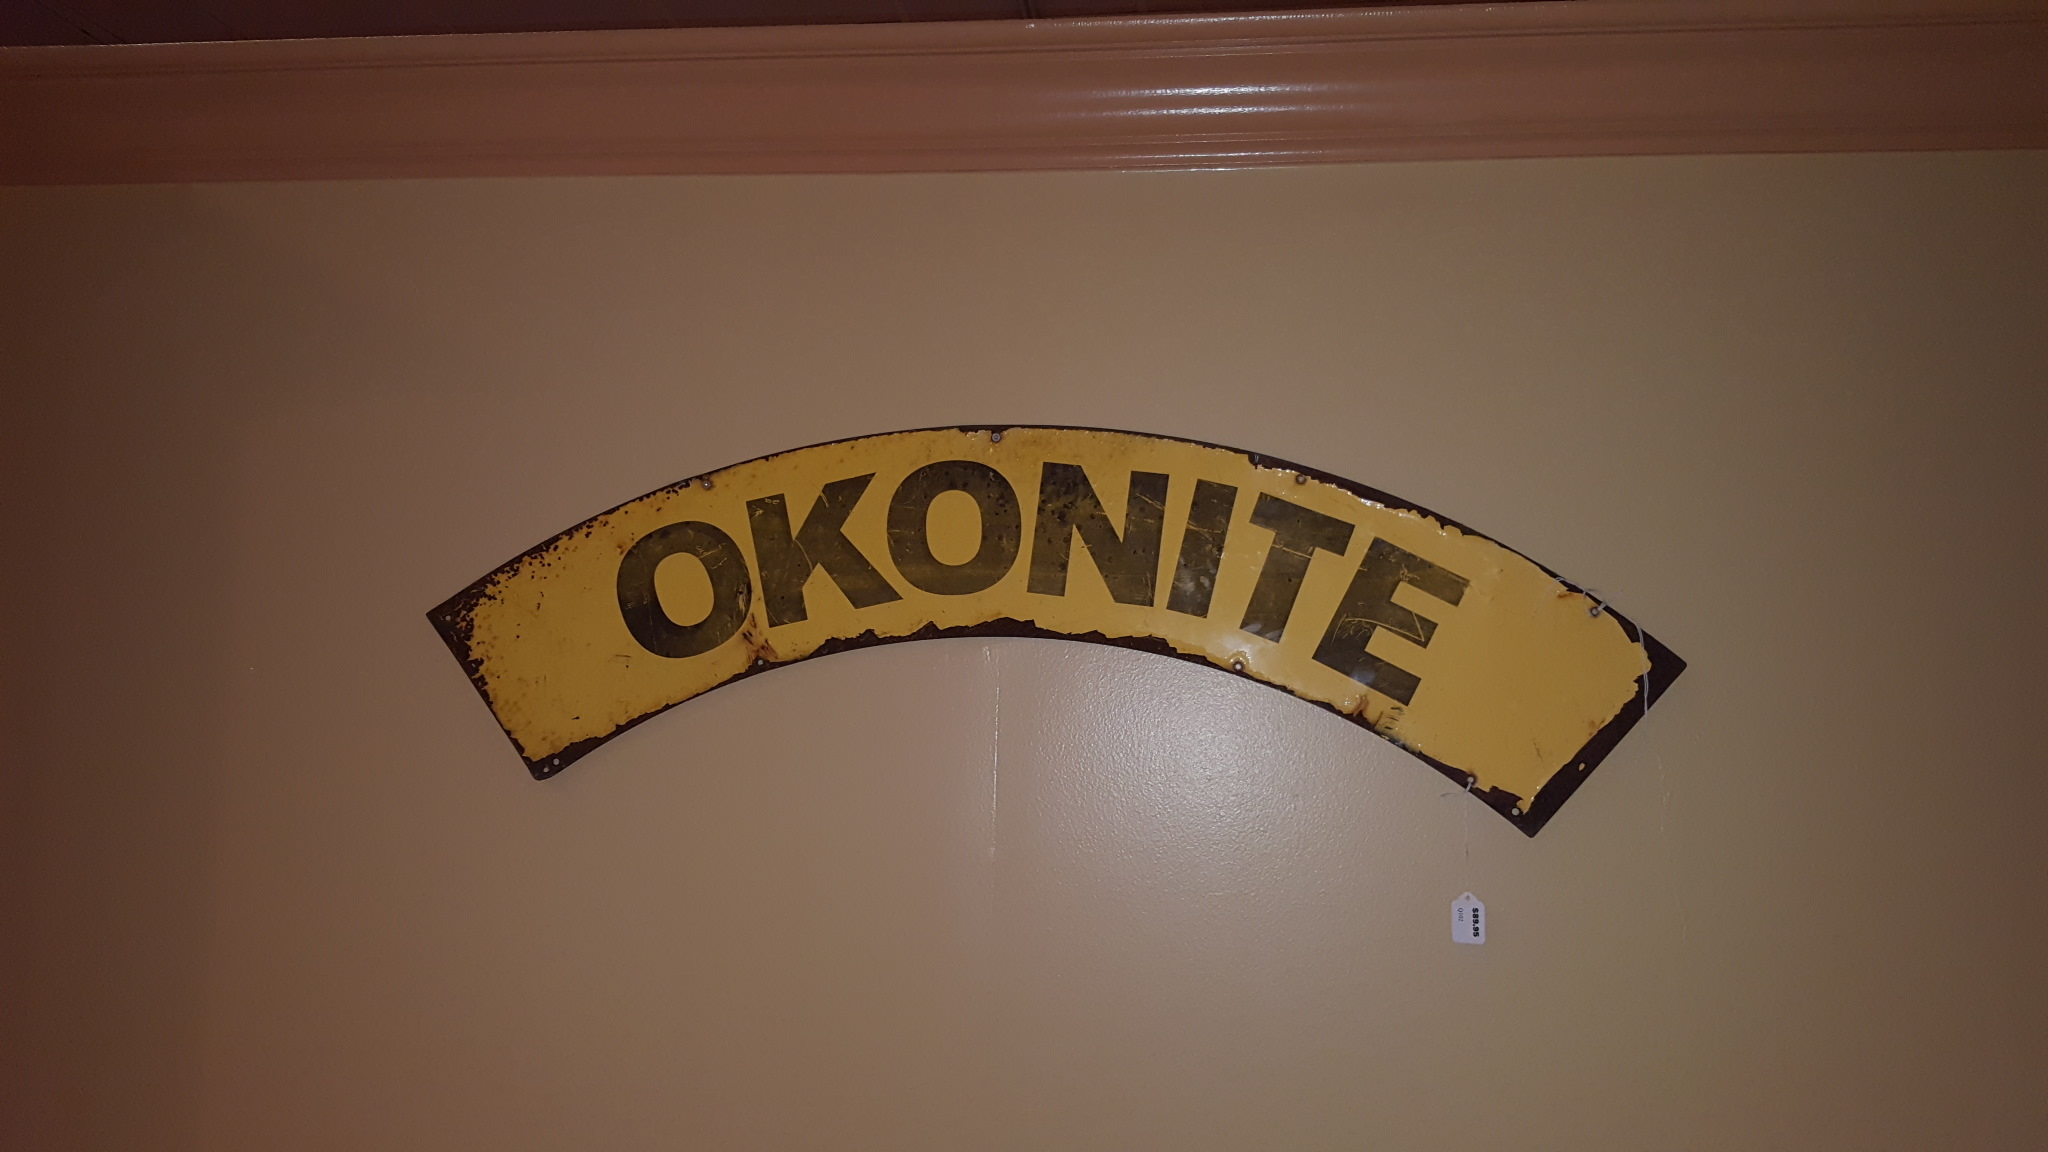 Okonite Wires Sign